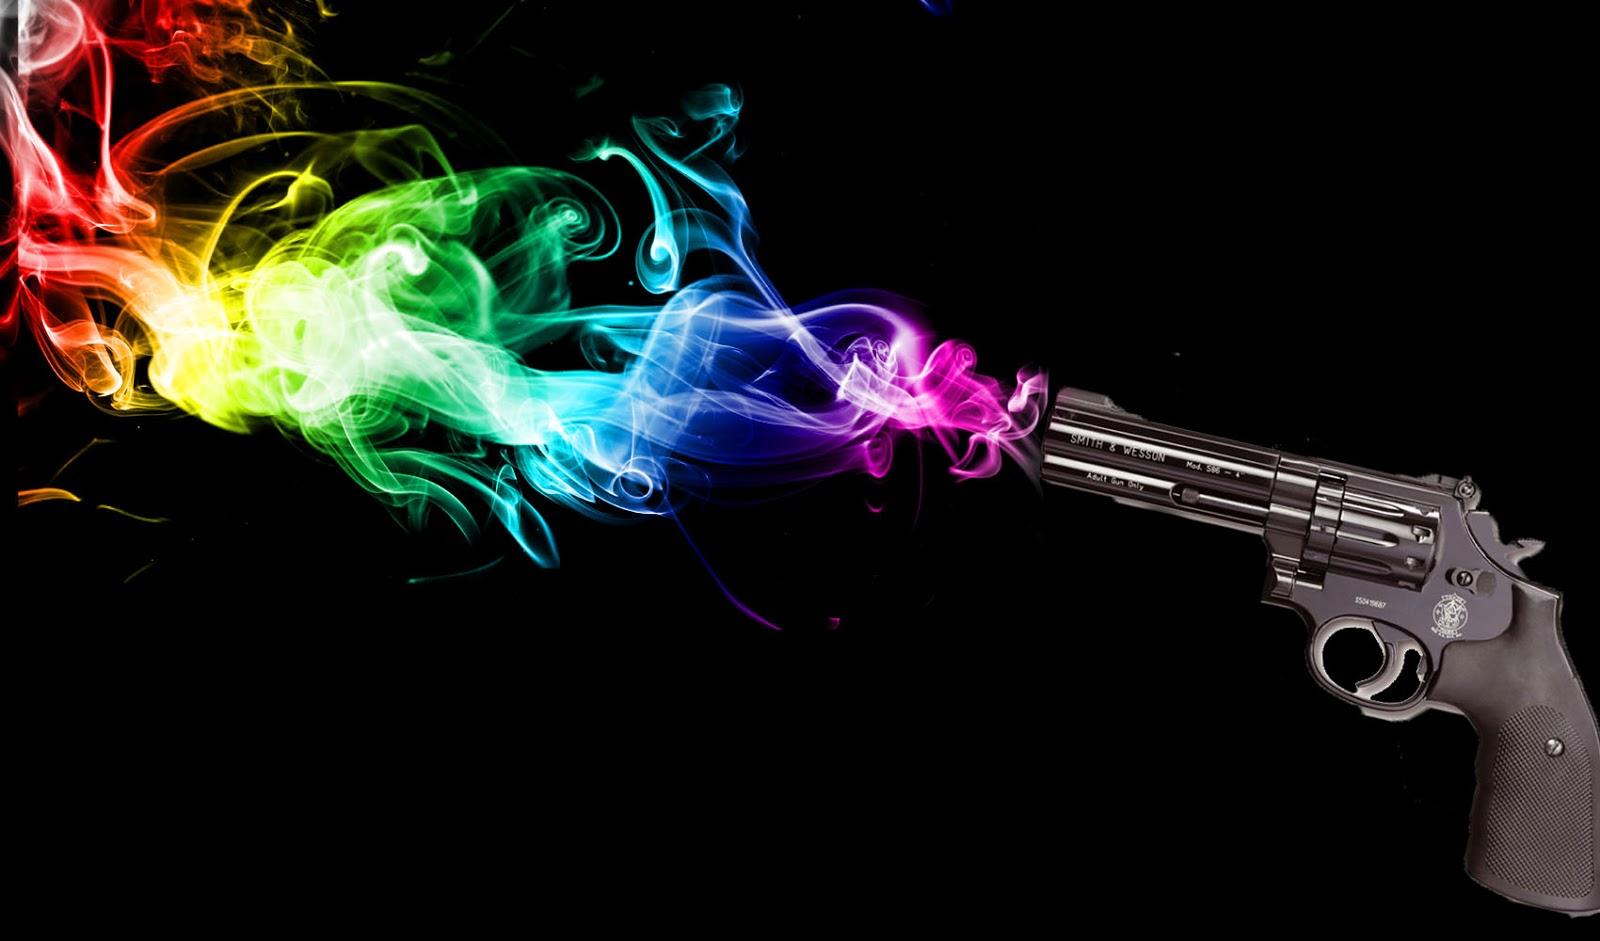 rainbow smoke hd wallpapers - desktop wallpapers